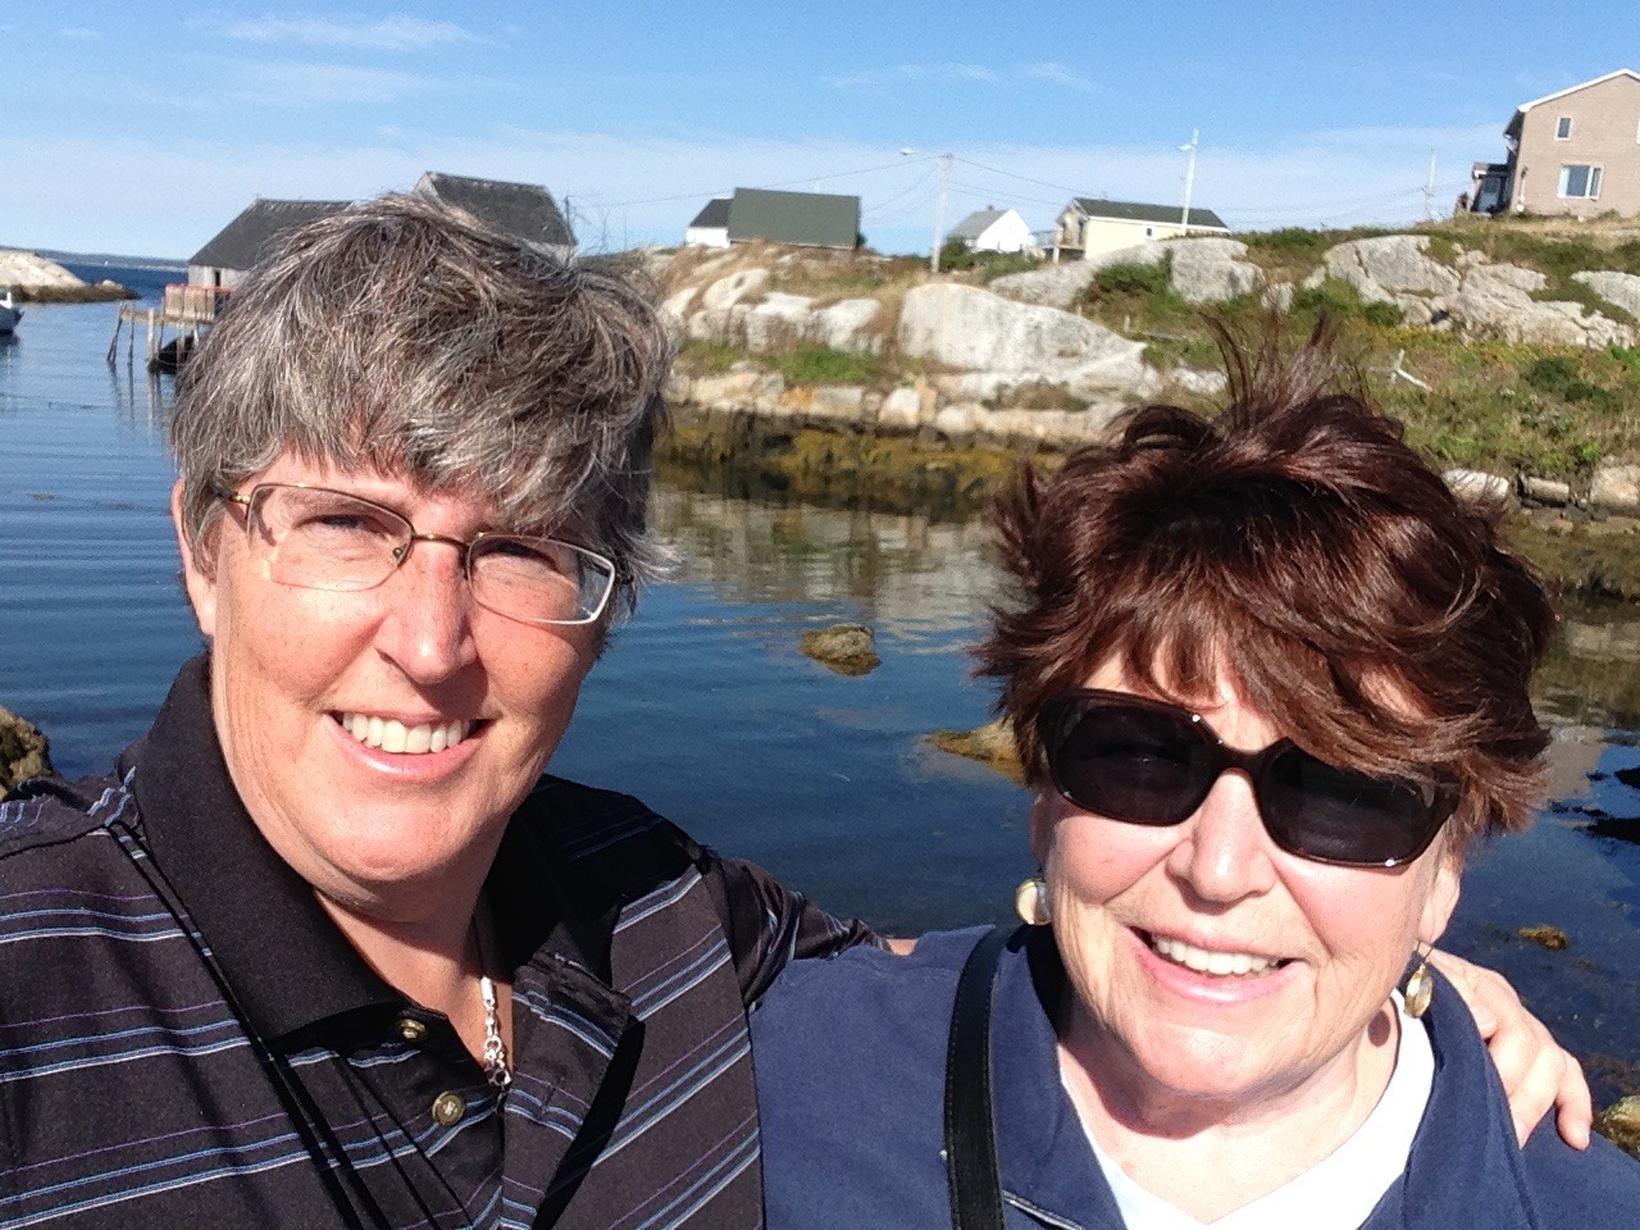 Roberta & Krista from San Diego, California, United States